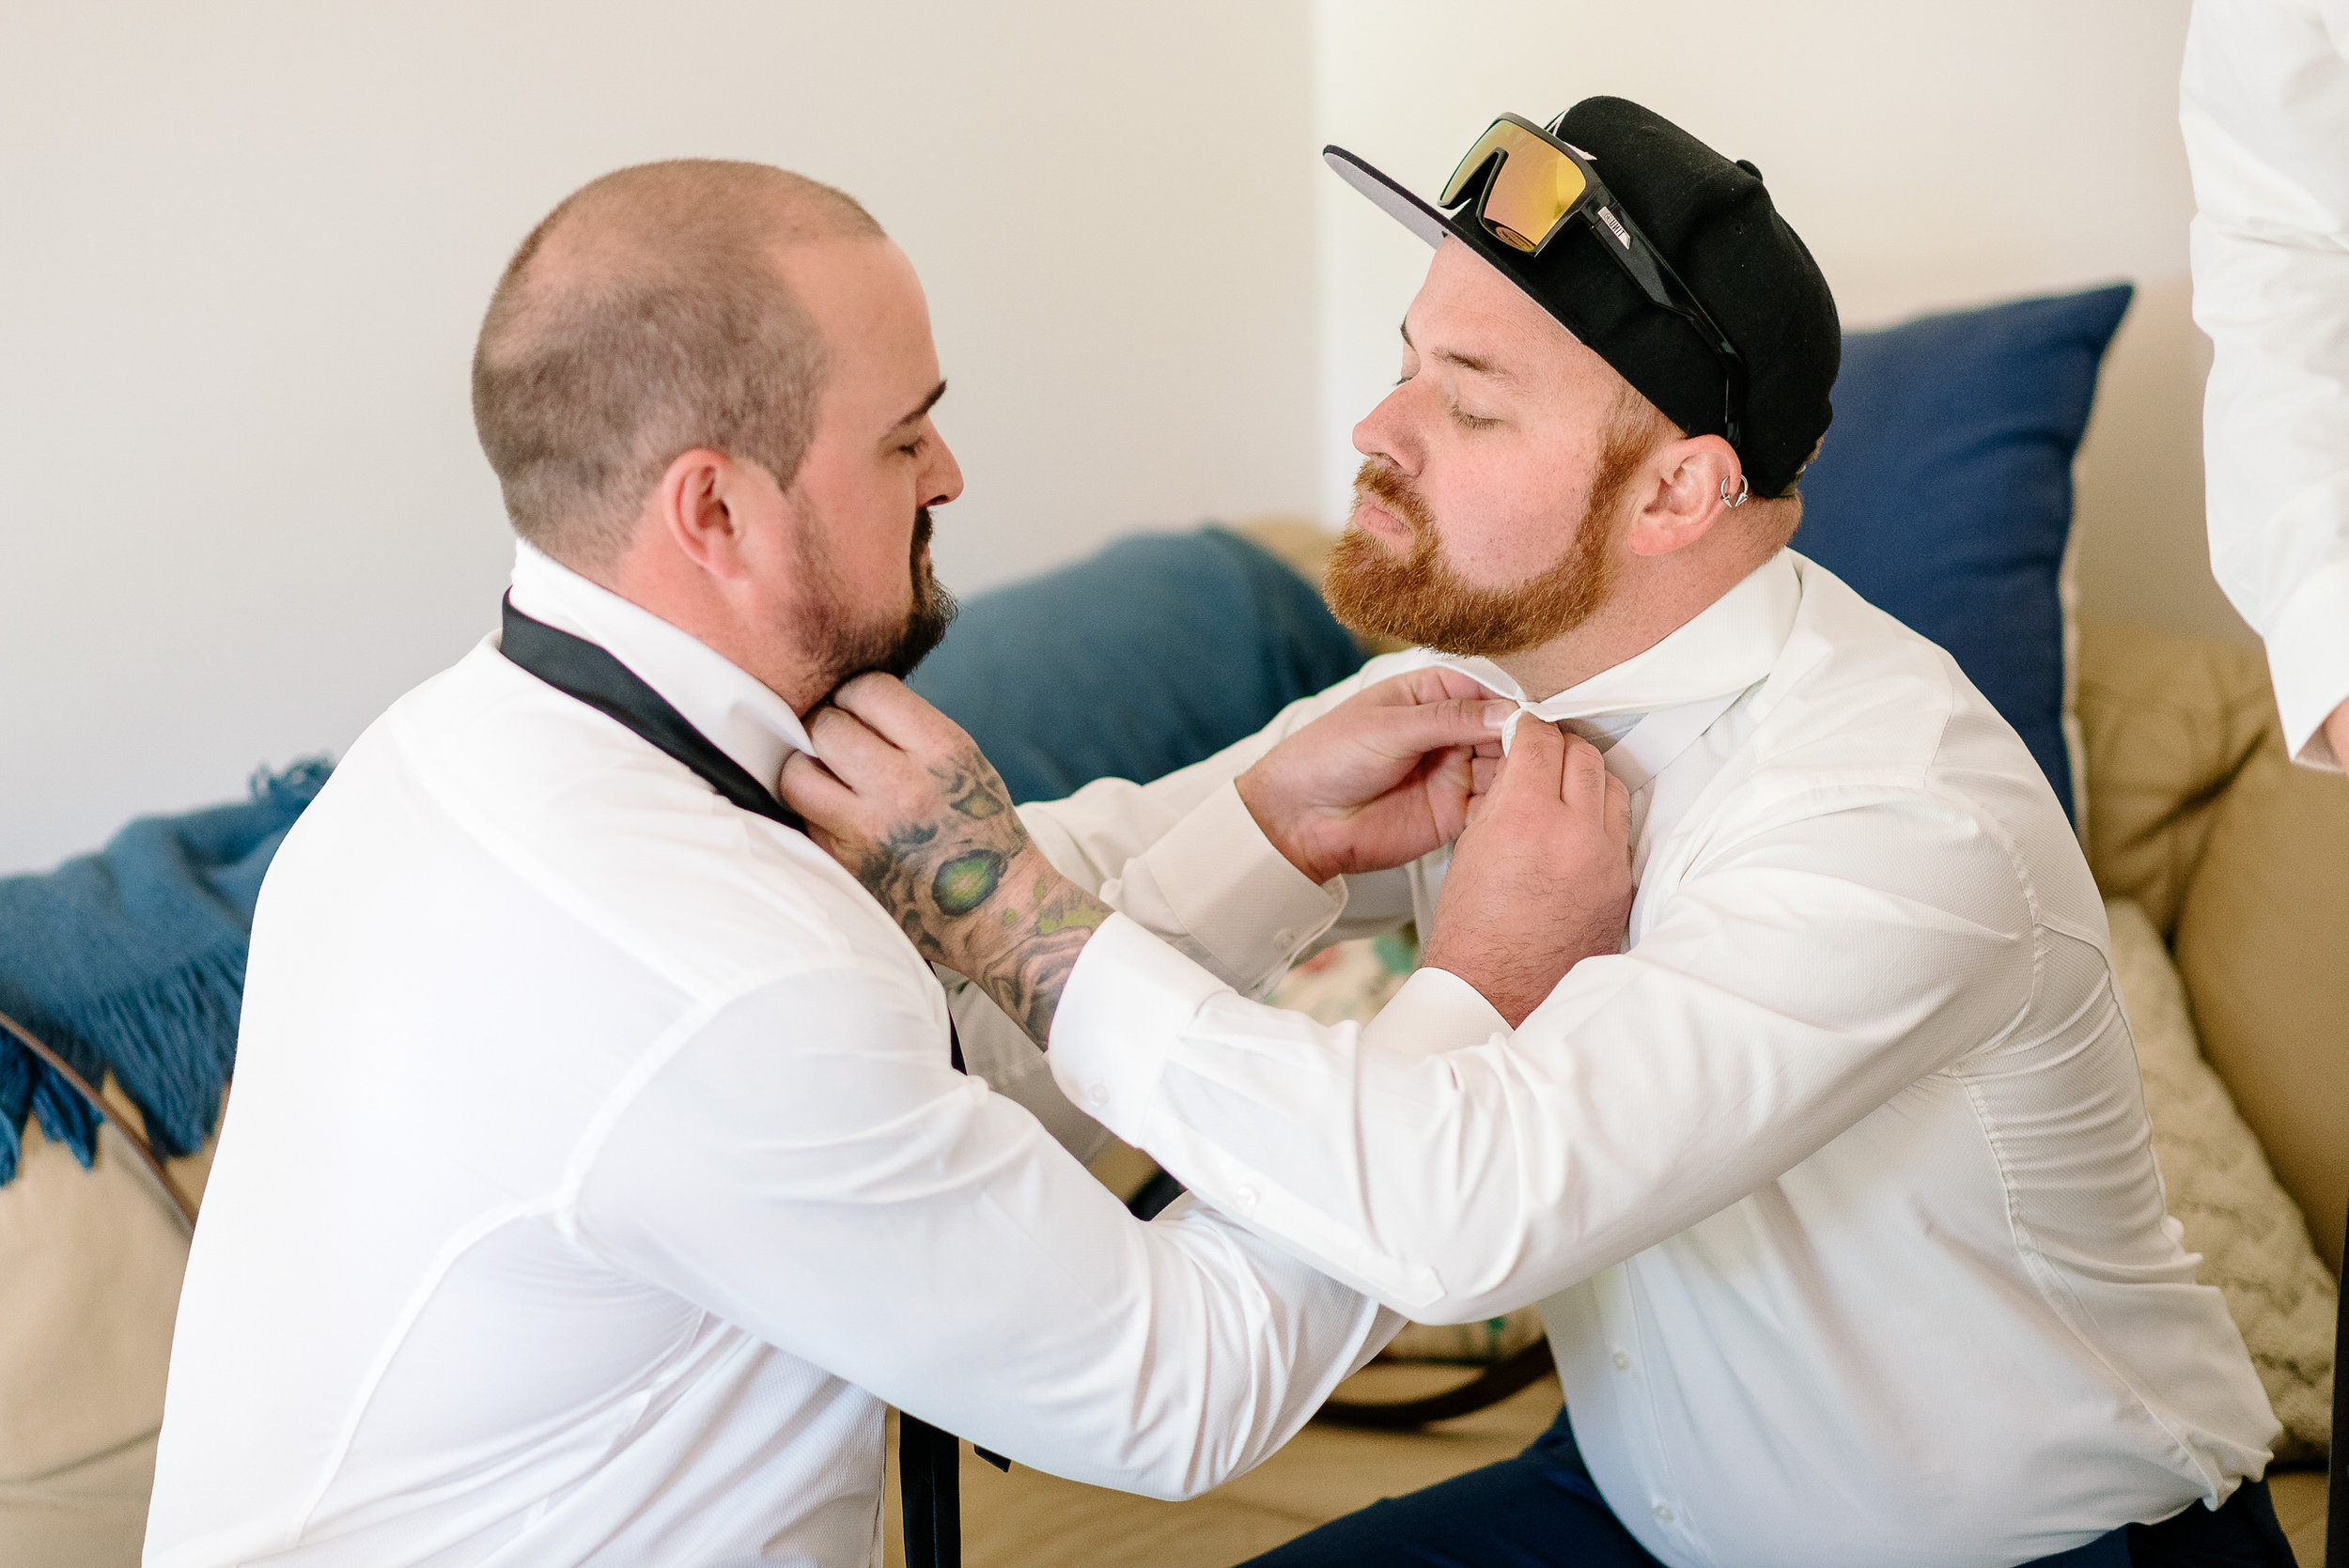 Justin_And_Jim_Photography_Portsea_Pub_Wedding10.JPG